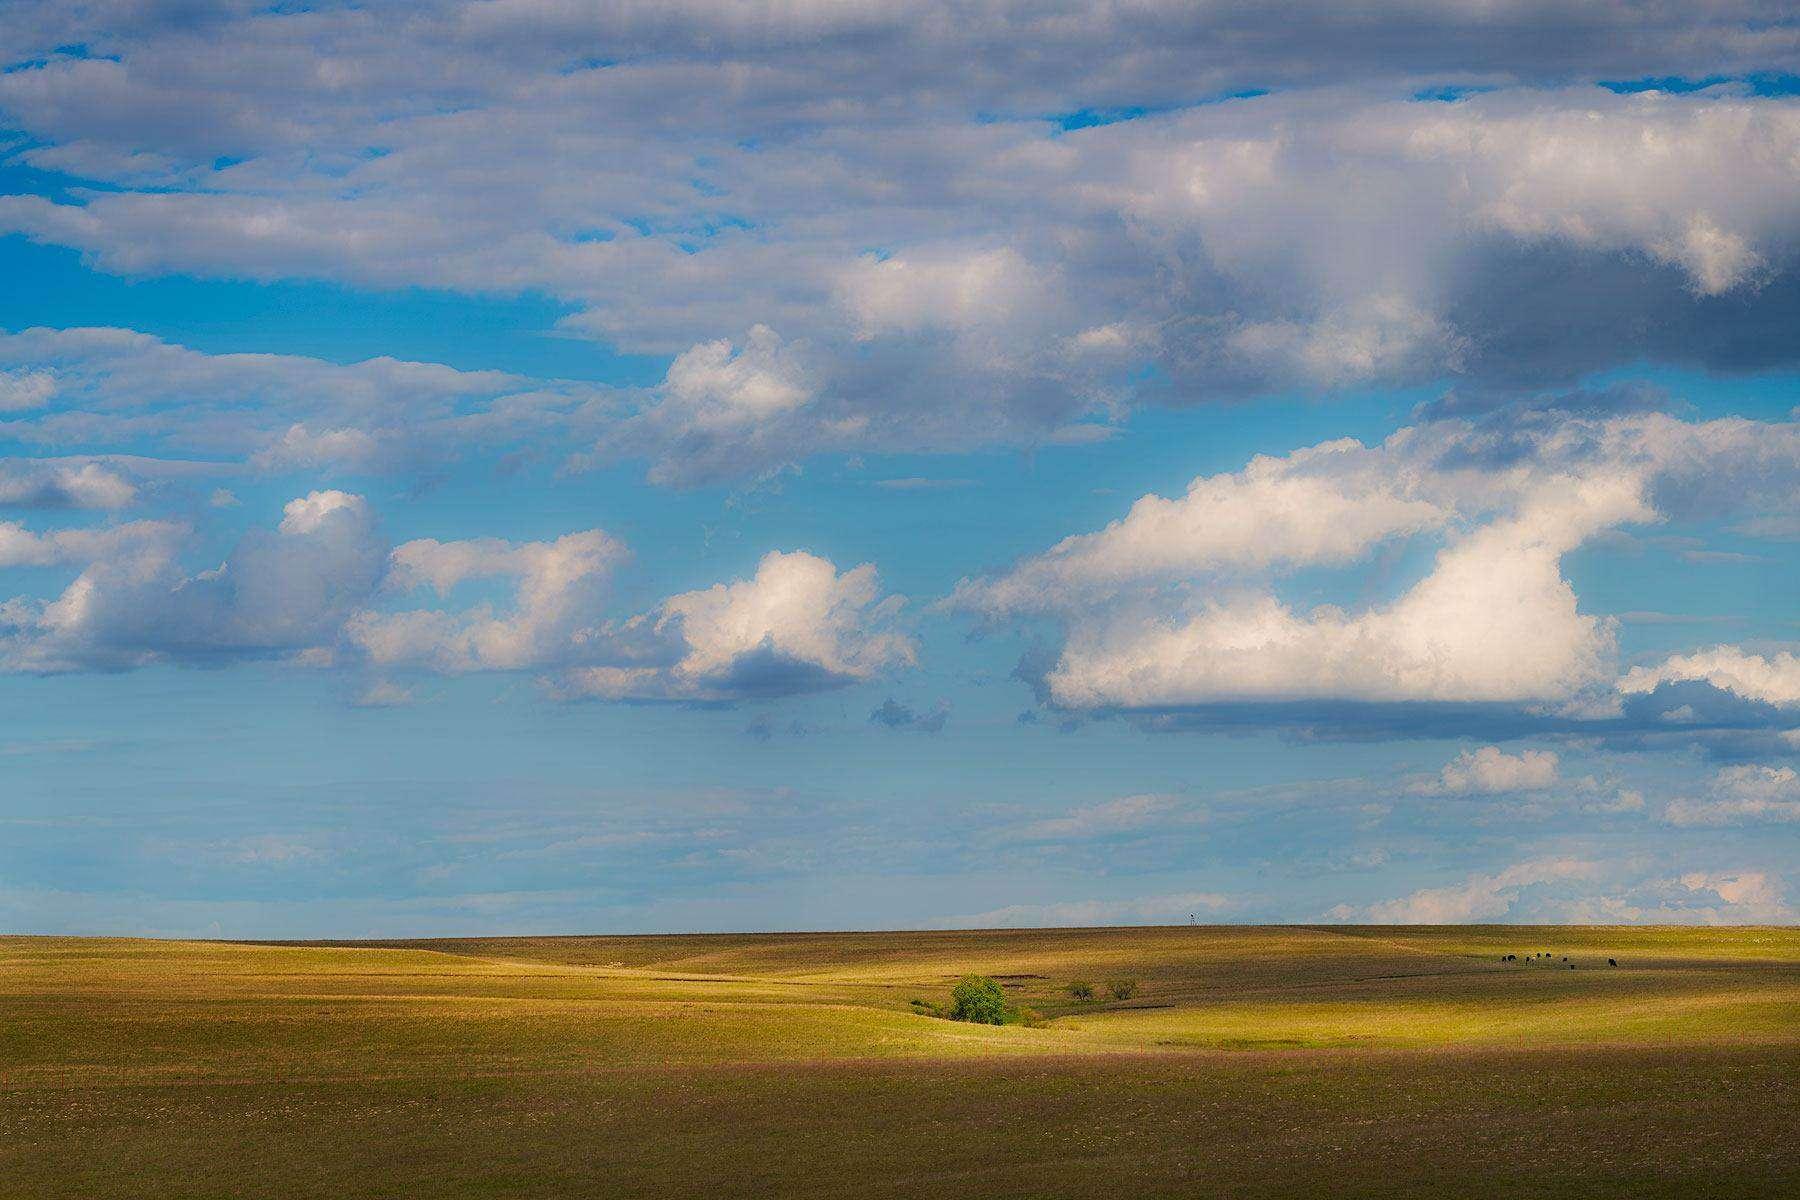 Kansas tallgrass prairie landscape photography